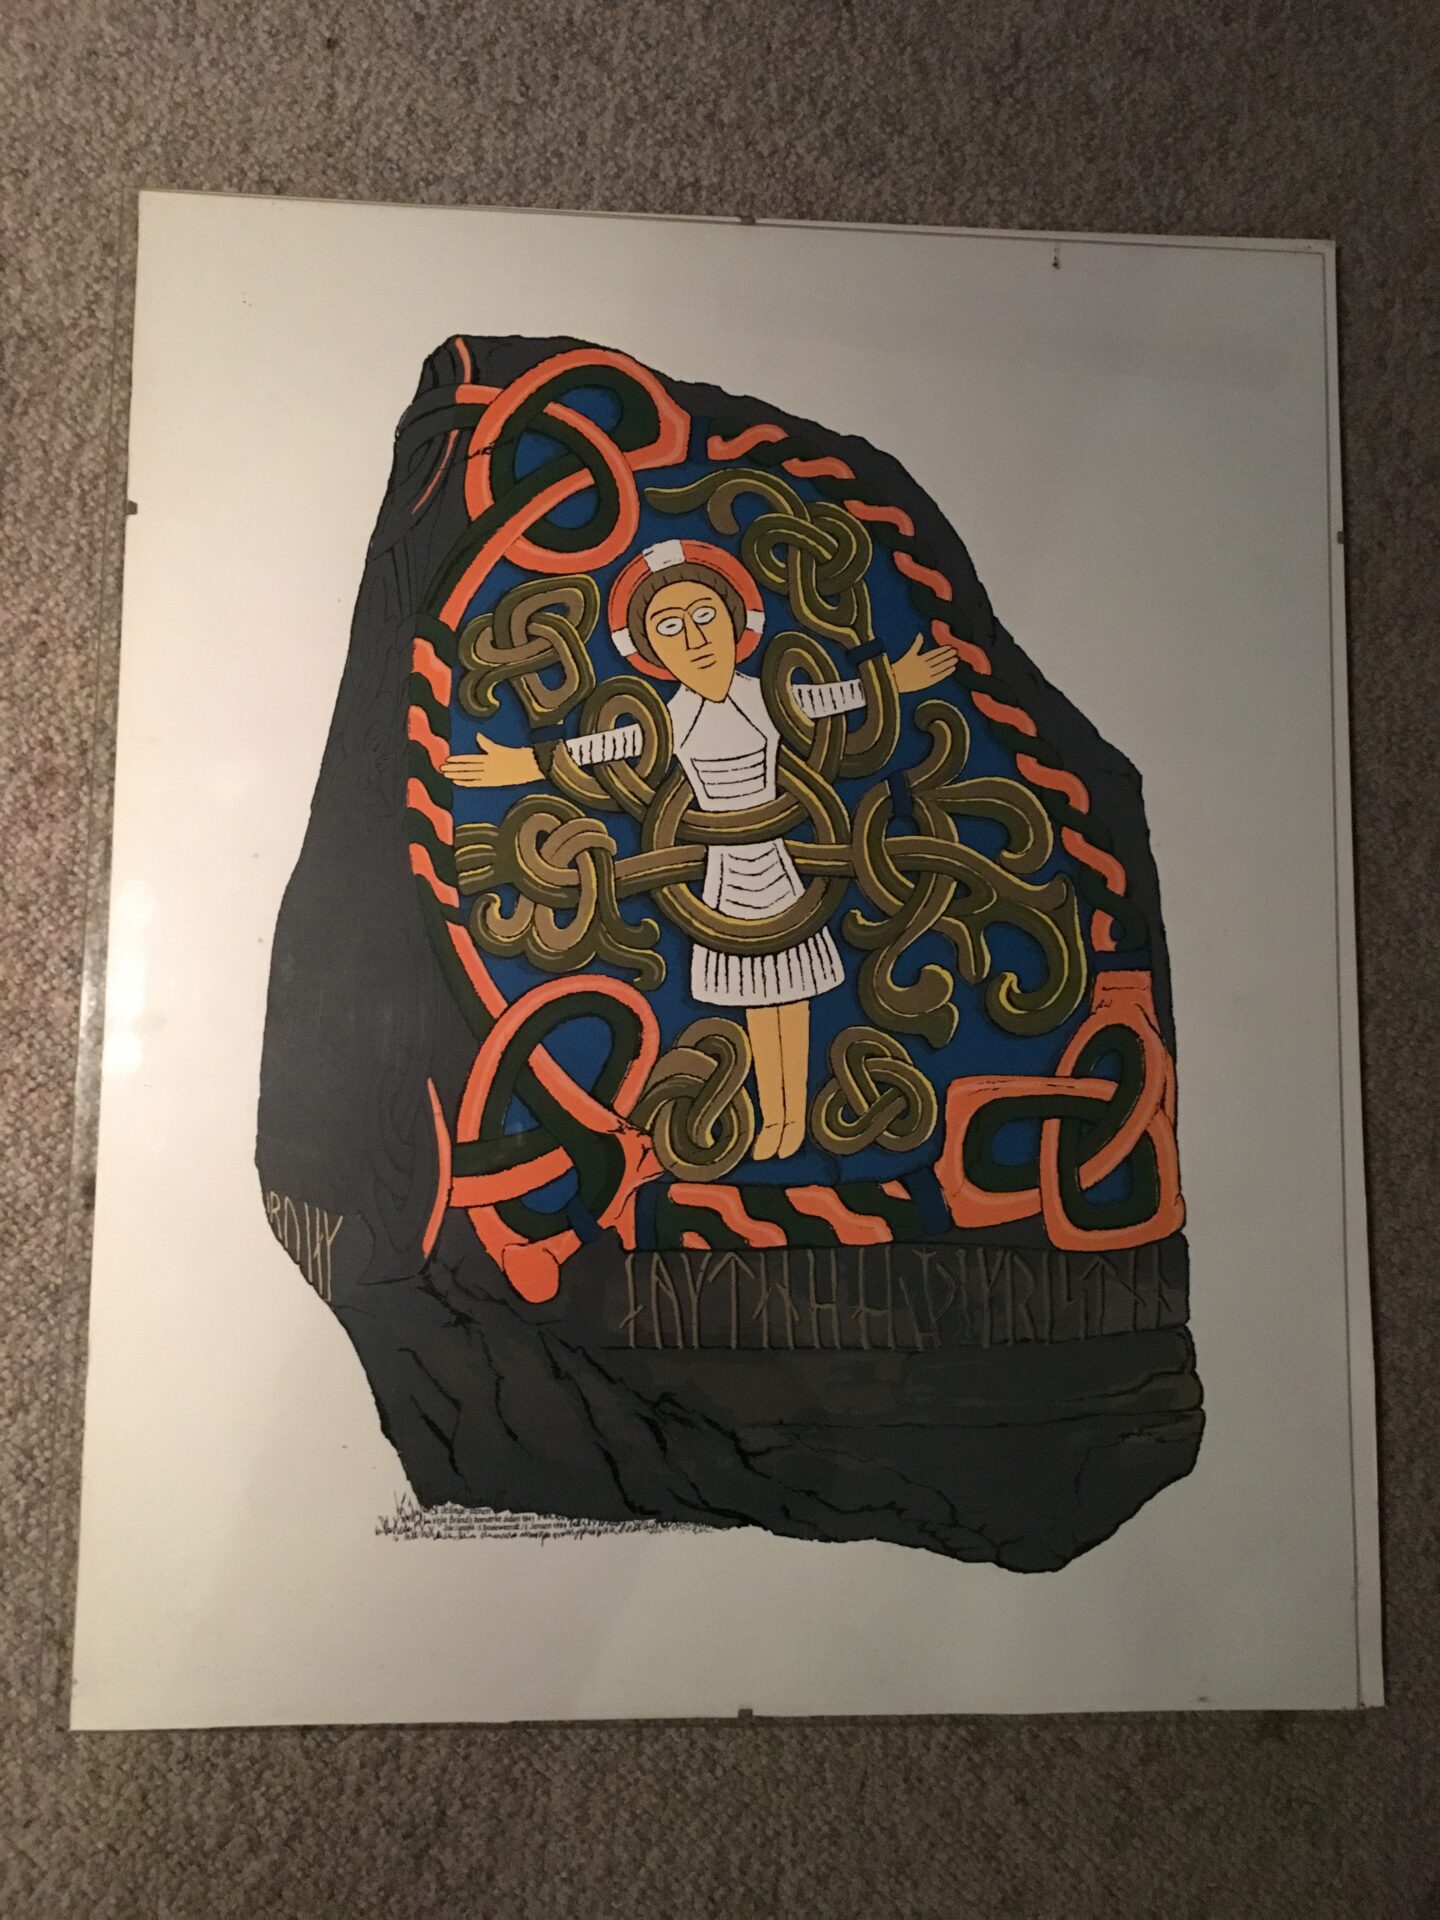 Jelling stenen, kunsttryk, 60x50 cm, pris 200 kr